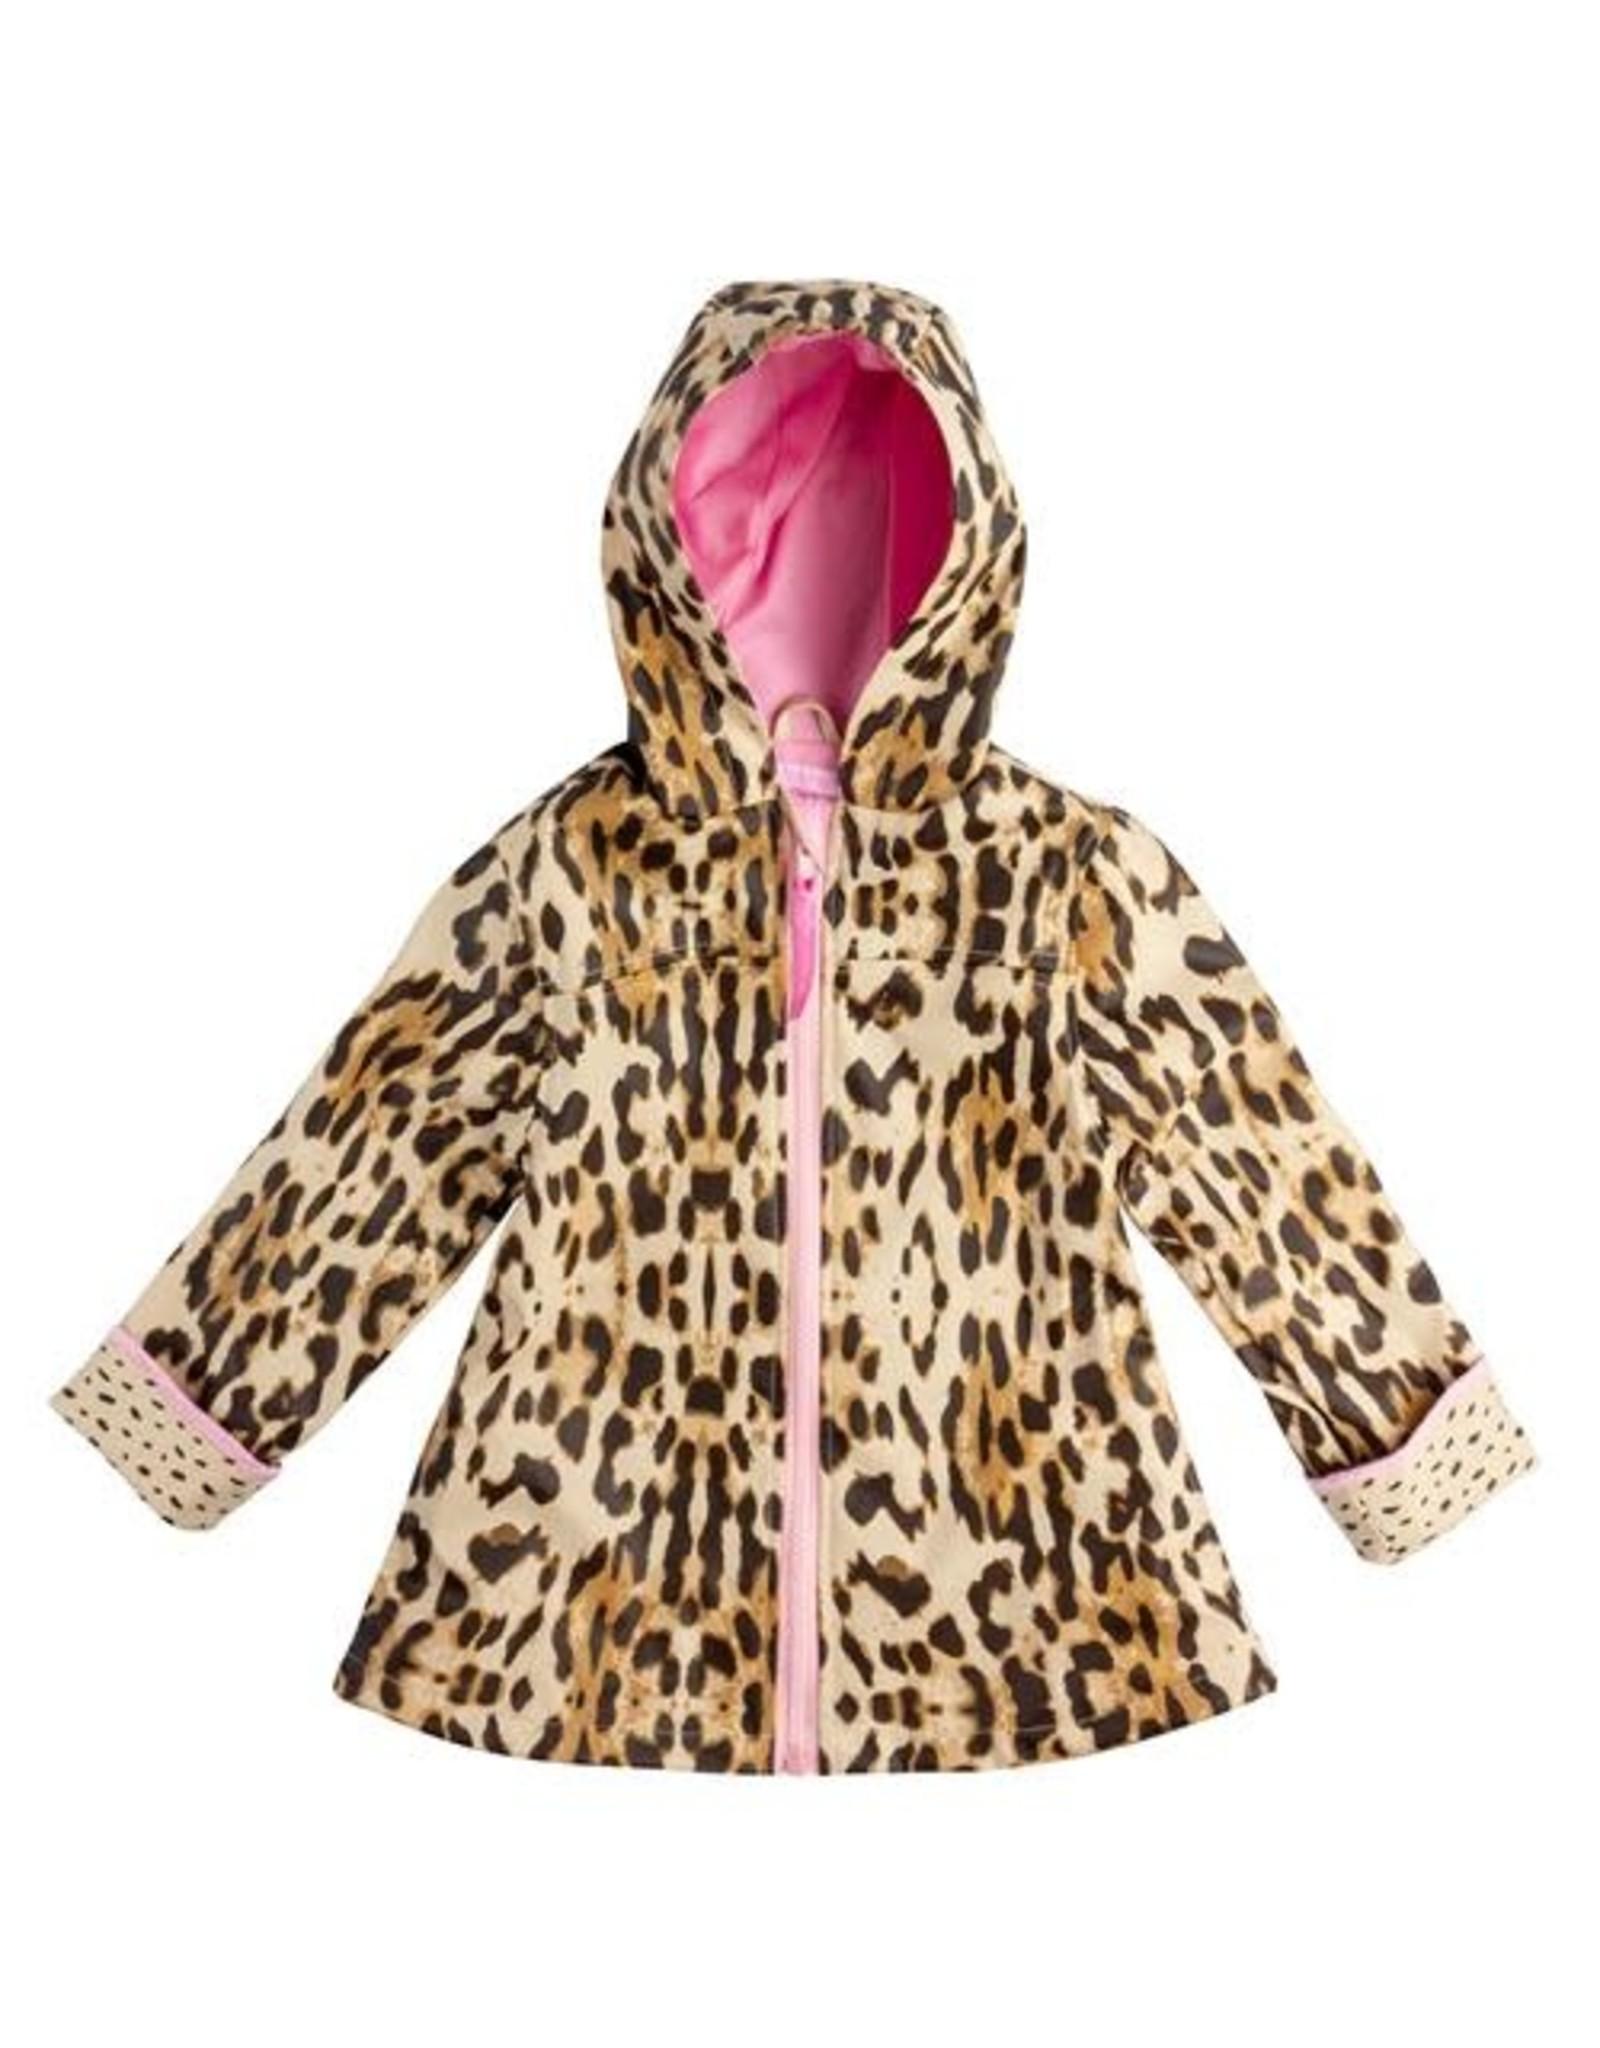 Stephan Joseph Leopard Raincoat